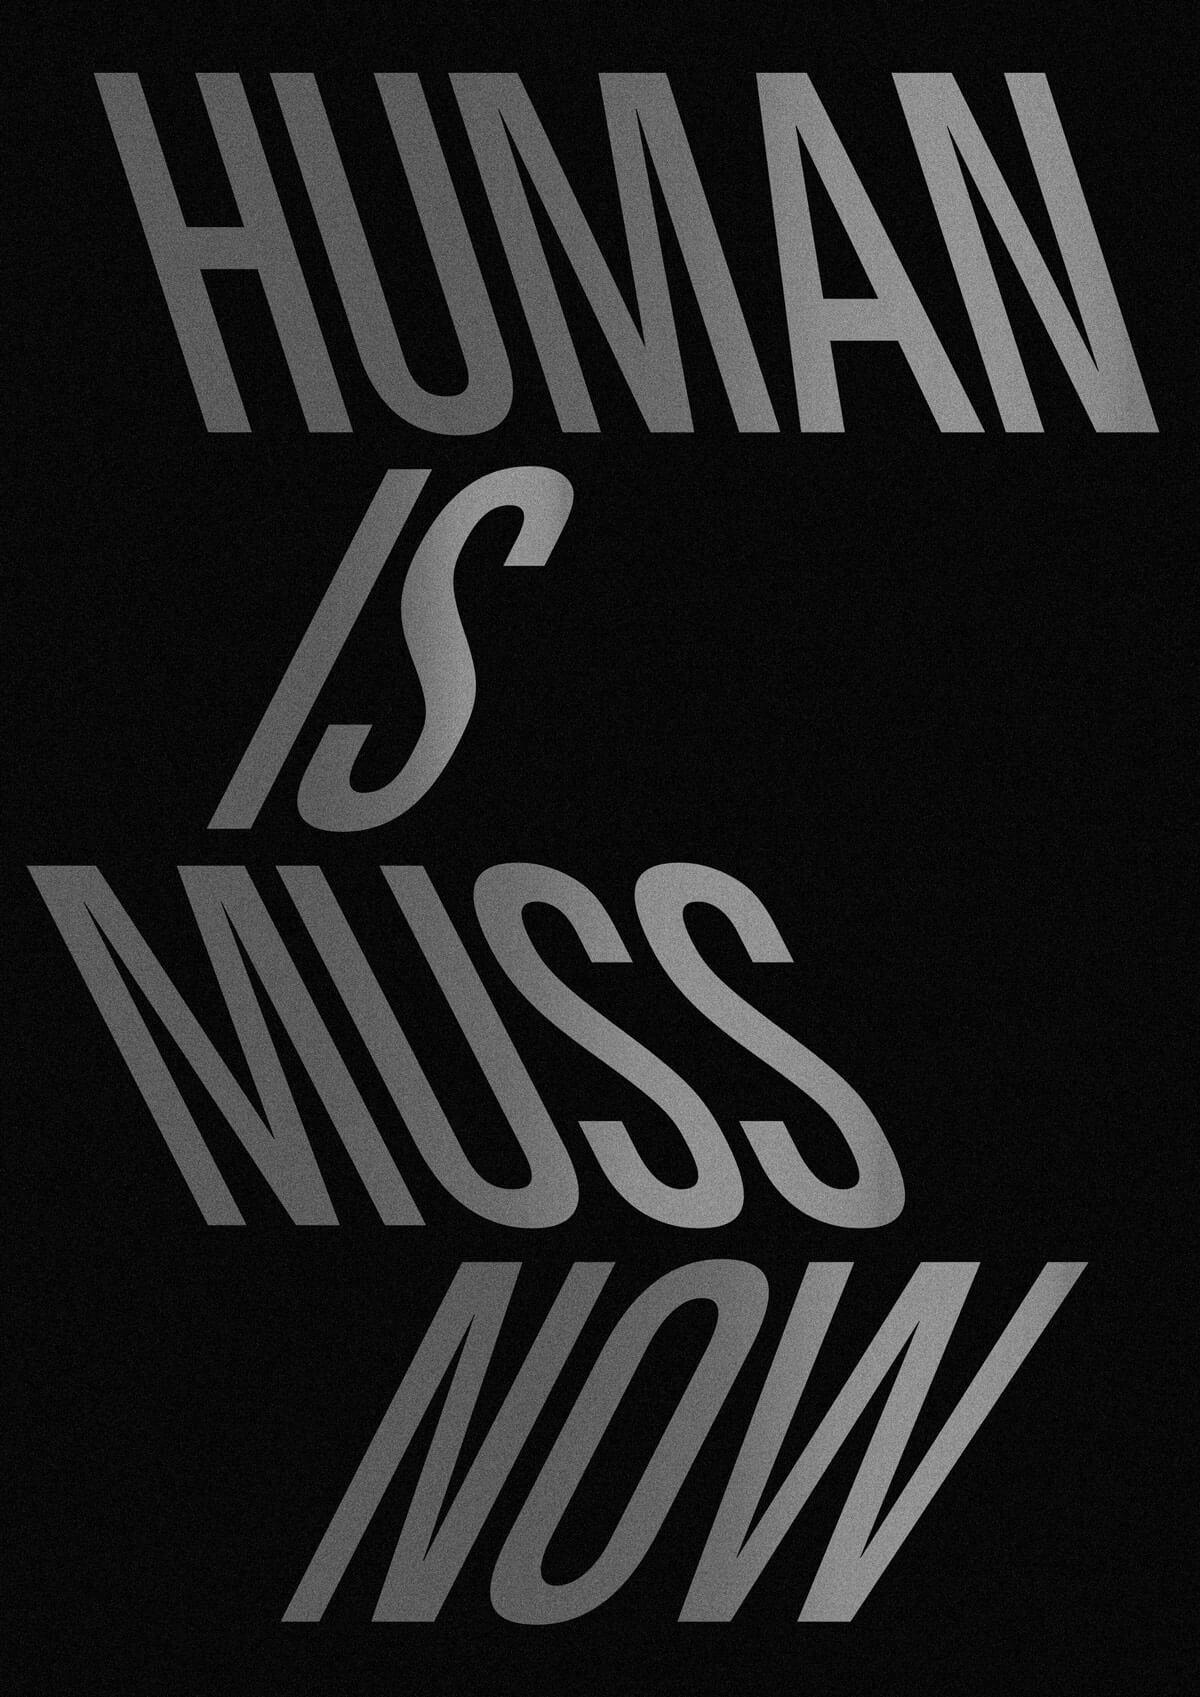 Human_is_muss6 Humanismus